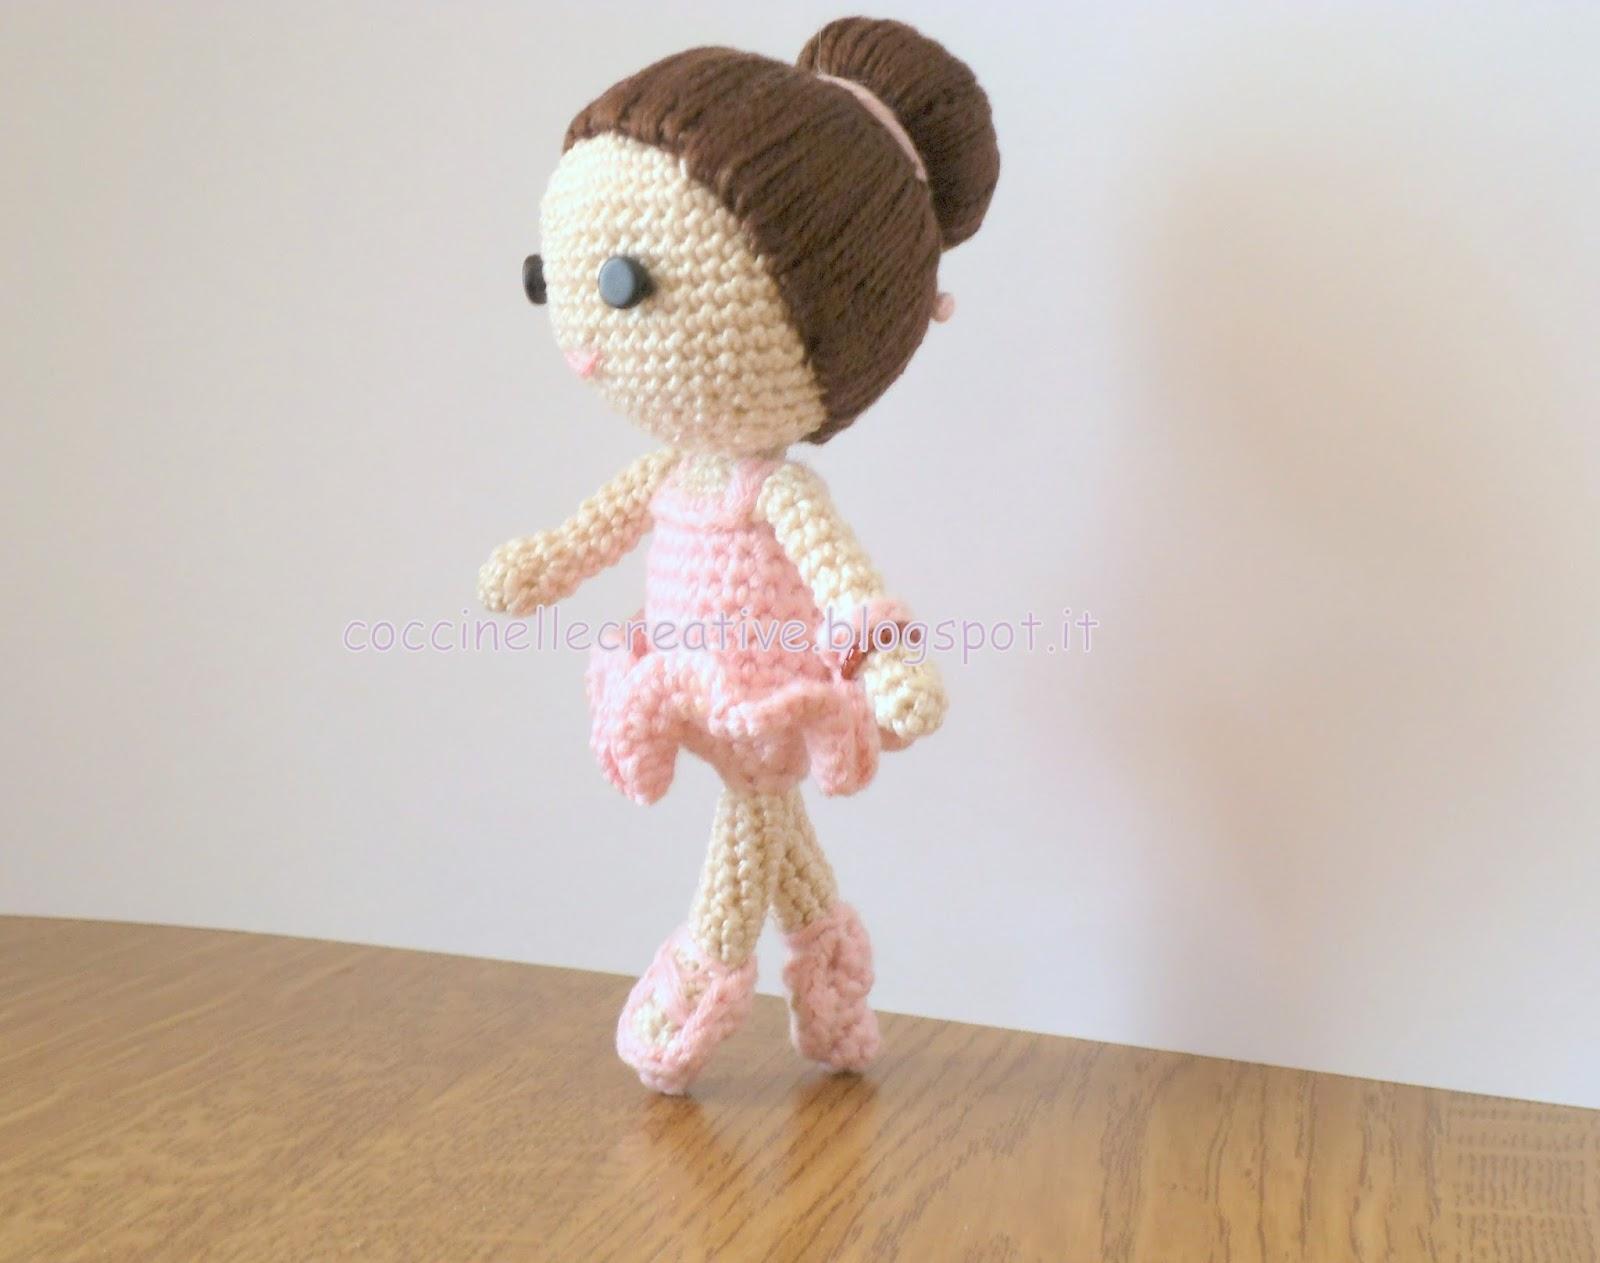 Amigurumi Tutorial Ballerina : Piccole coccinelle, la creativit? !! :